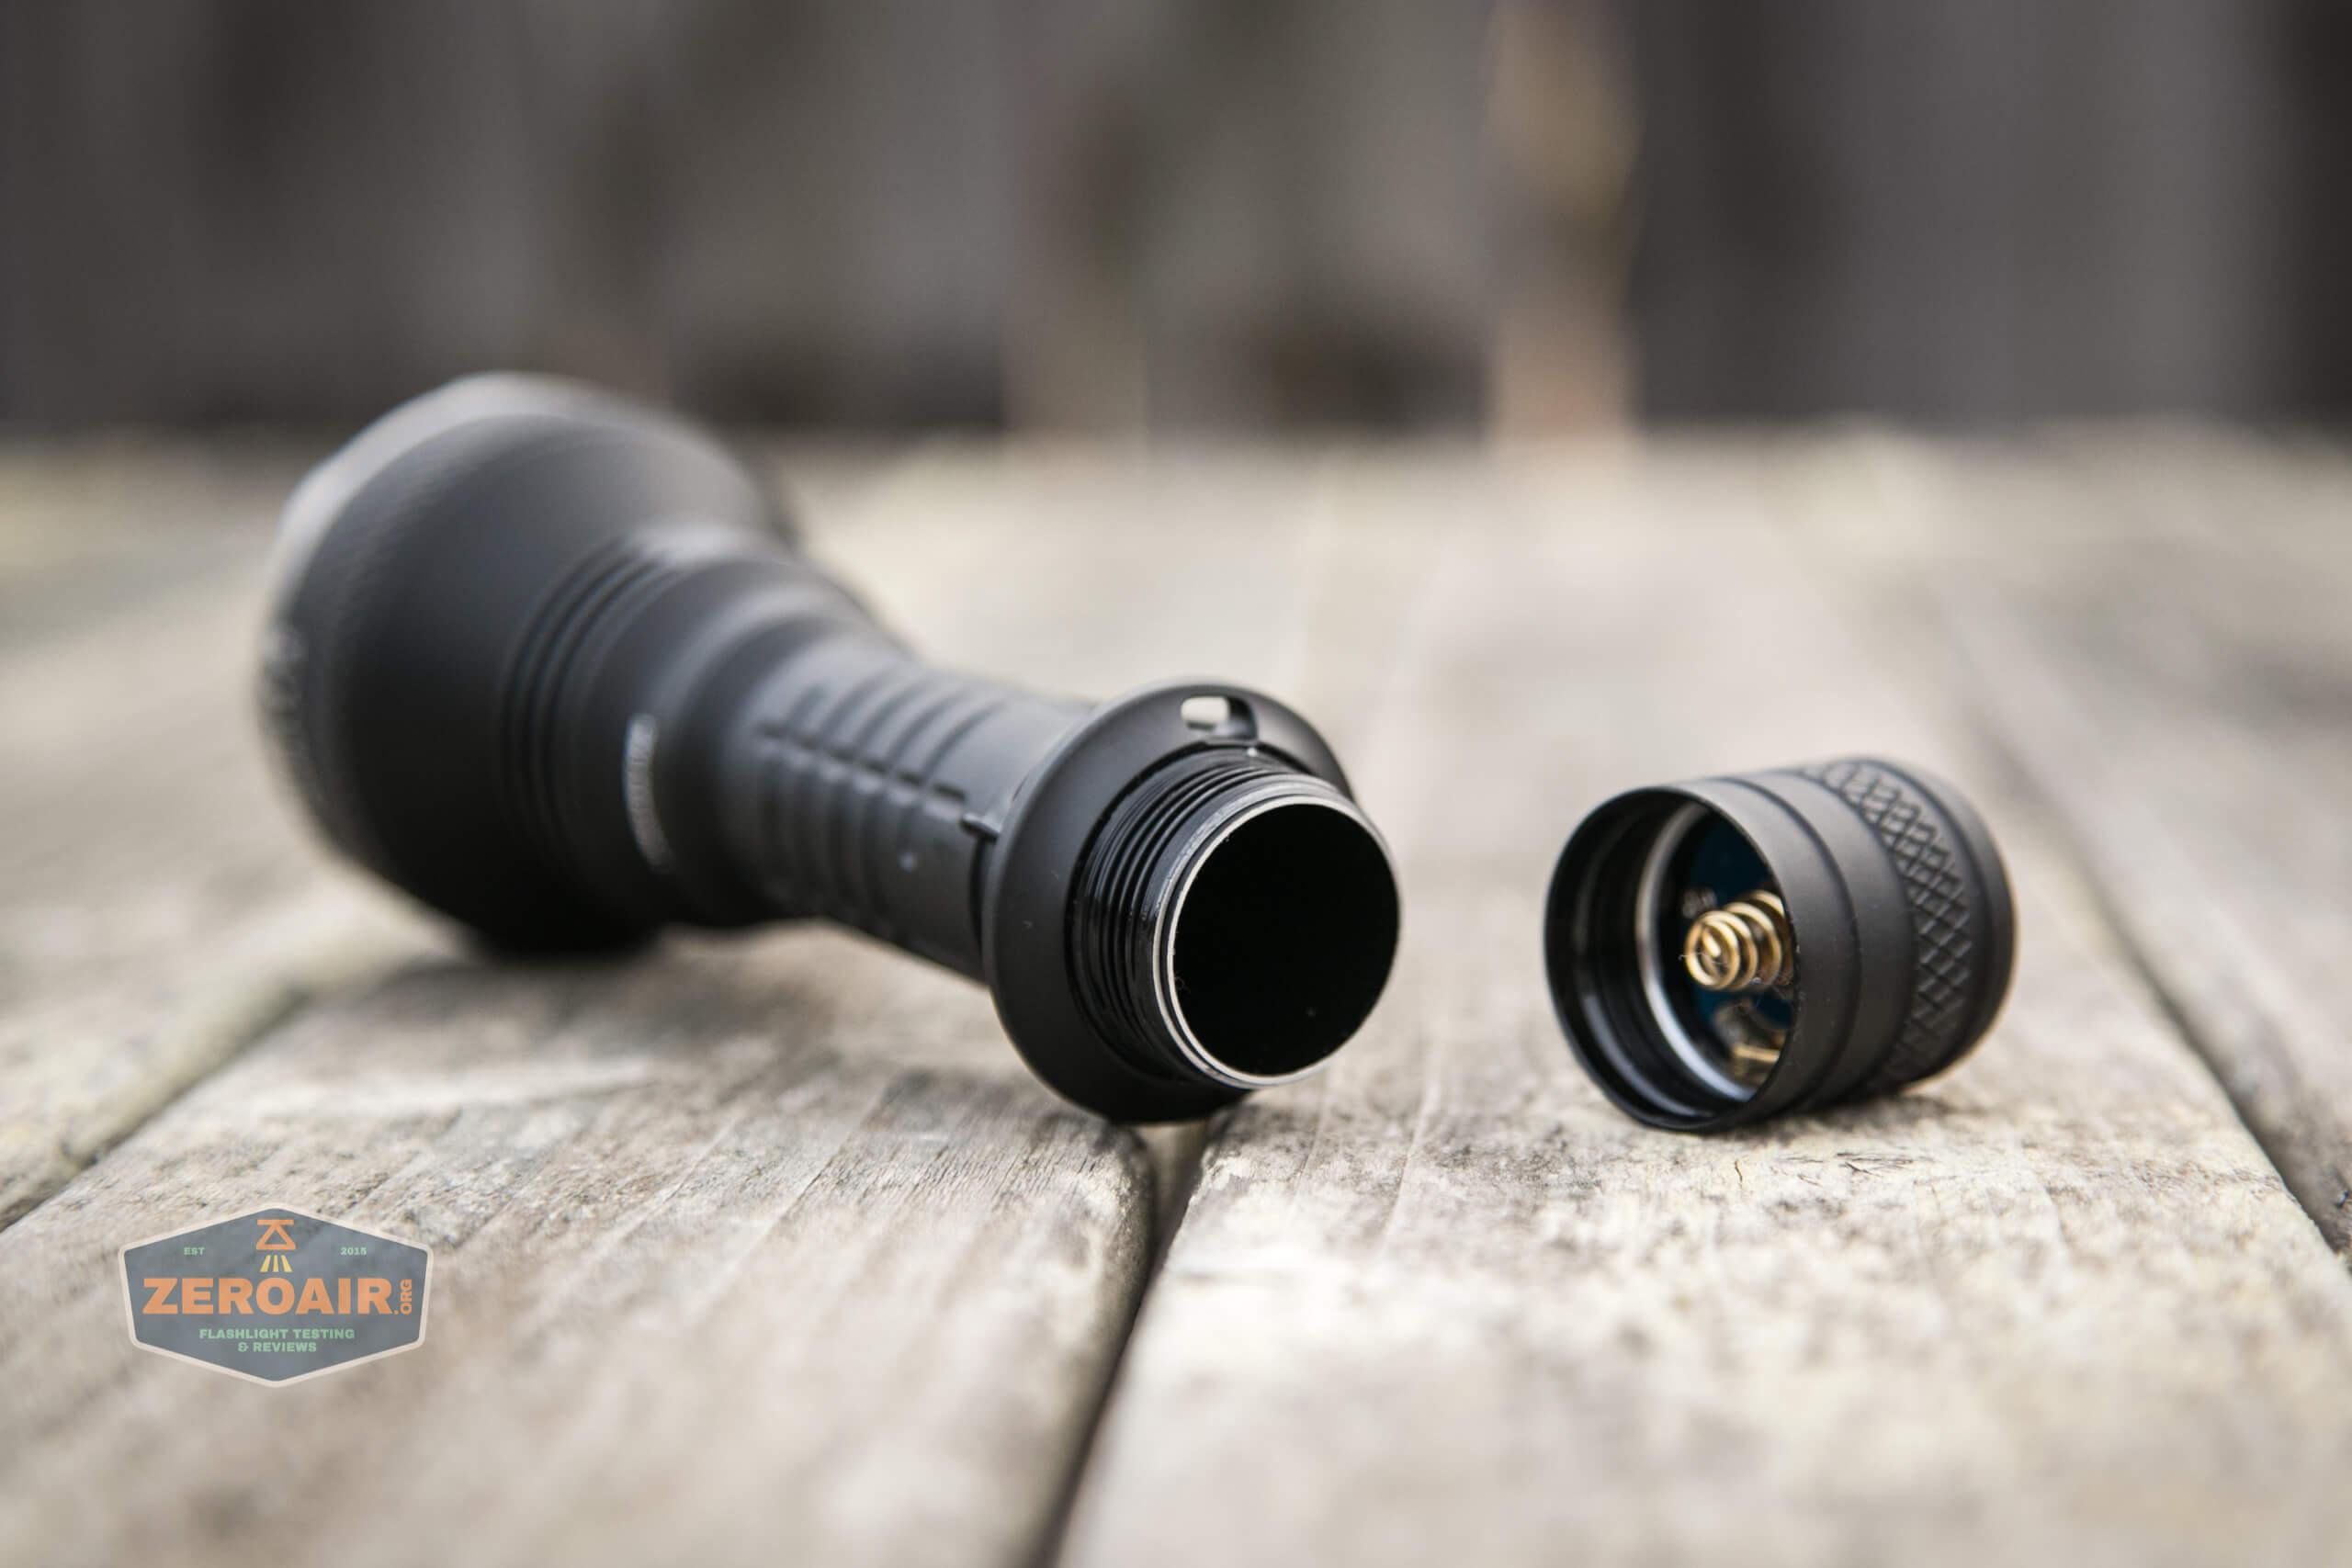 acebeam l35 flashlight cell tube sleeve